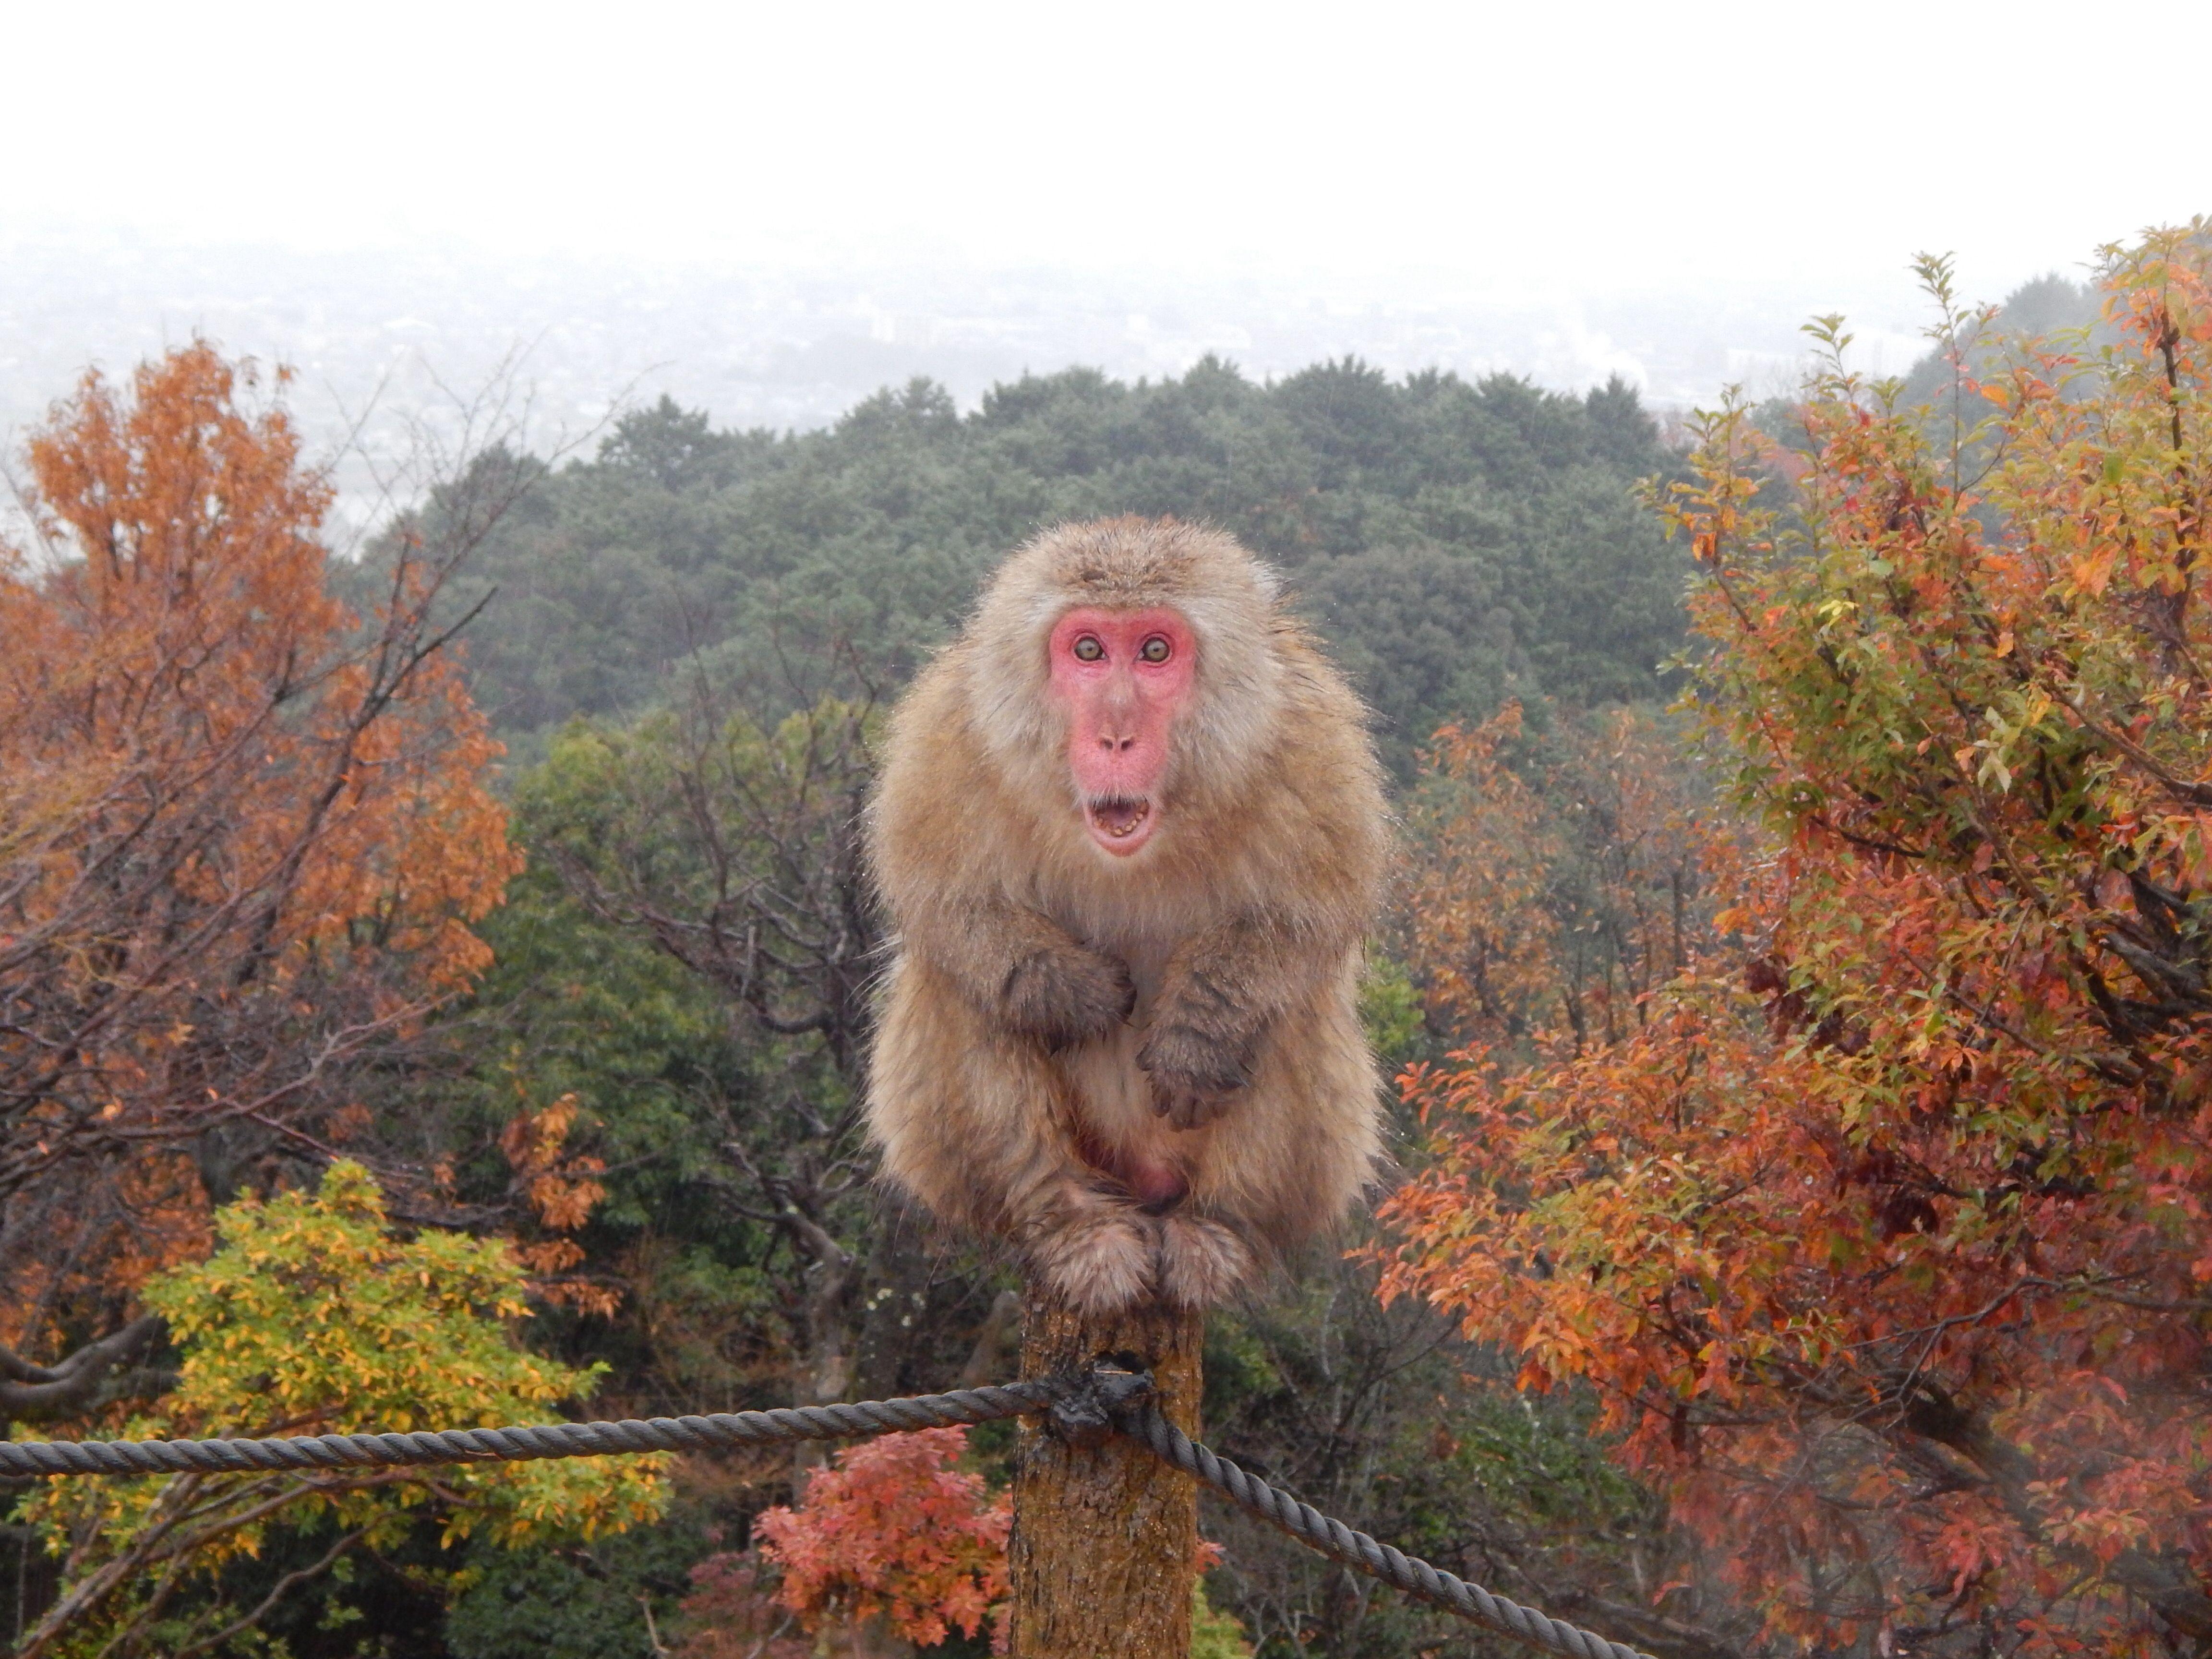 Monkey Forest, Japan, fall season, Japan travel #japan #japantravel #monkeyforest